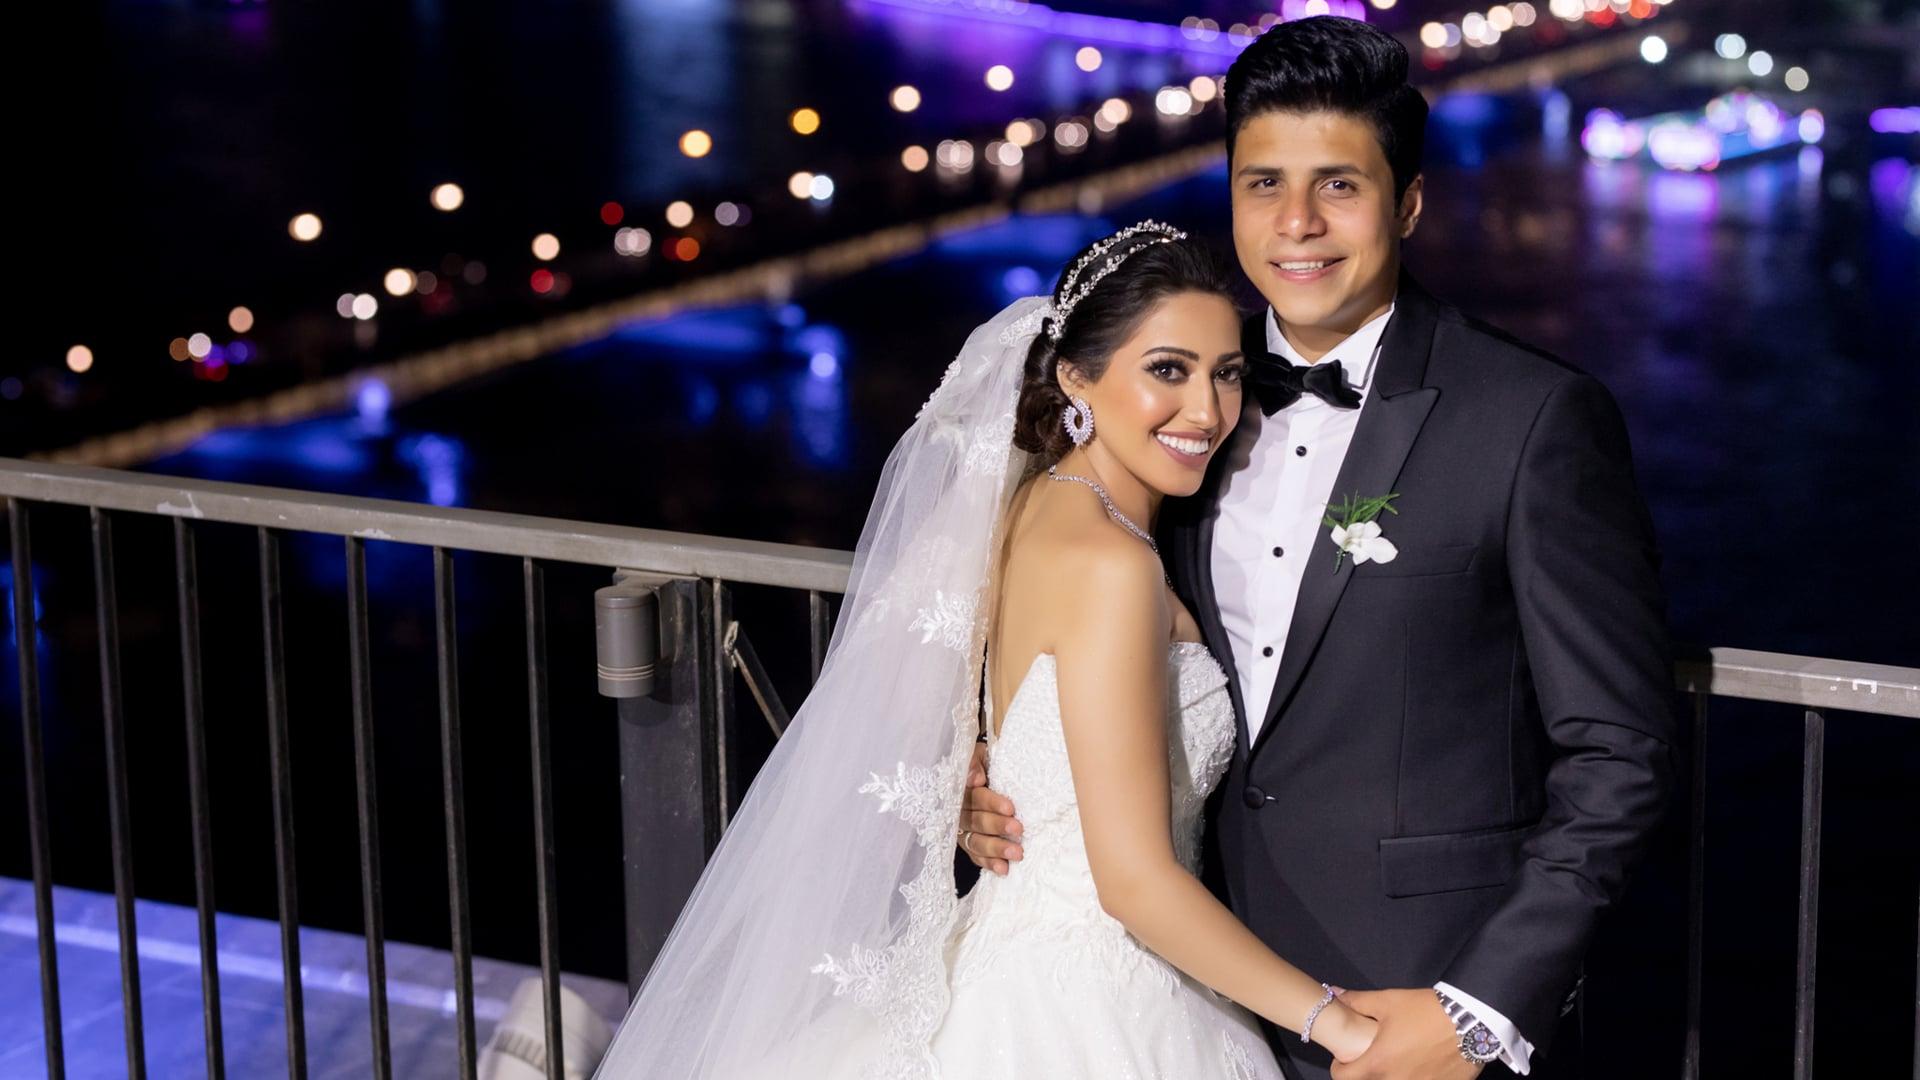 MENNA & SEIF WEDDING FILM